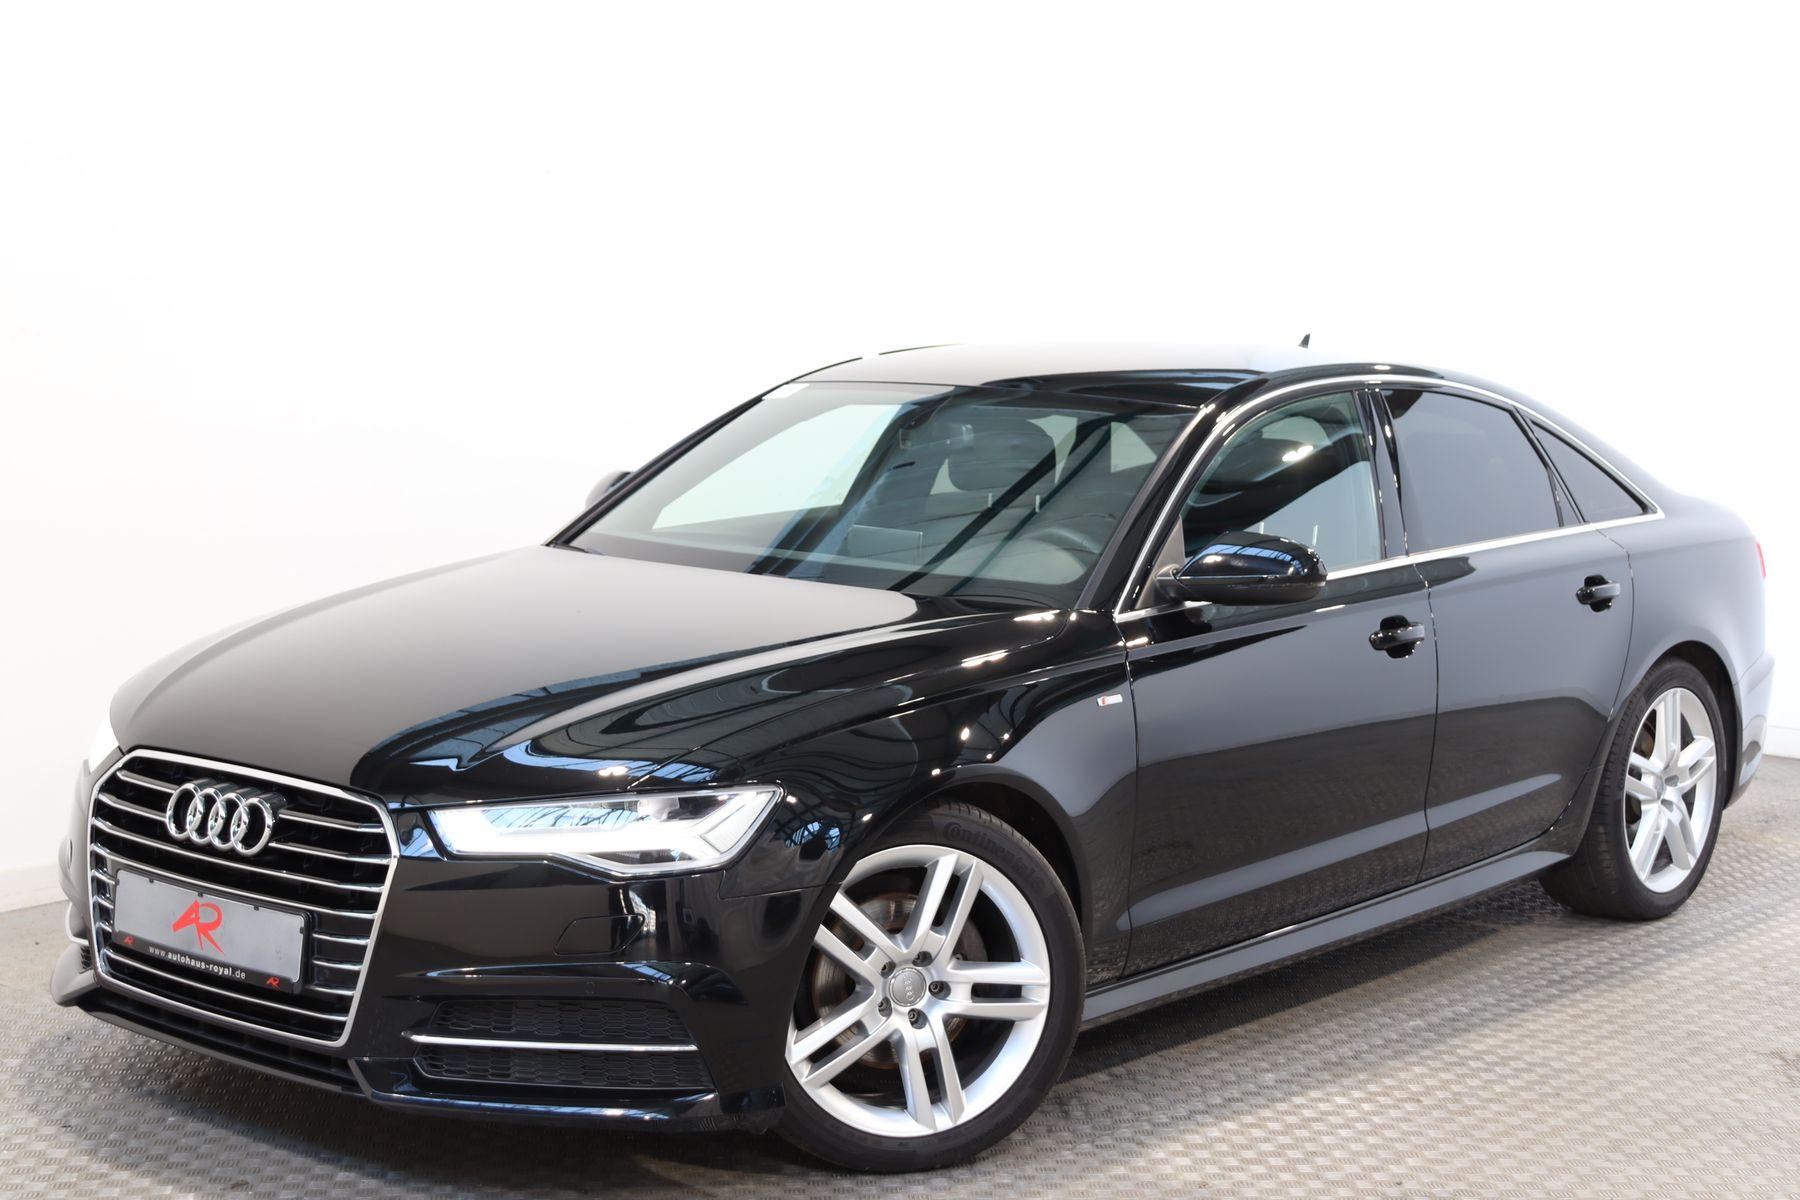 Audi A6 2.0 TDI 3x S LINE SPORT LED,MEMORY,KAMERA,19Z, Jahr 2015, Diesel